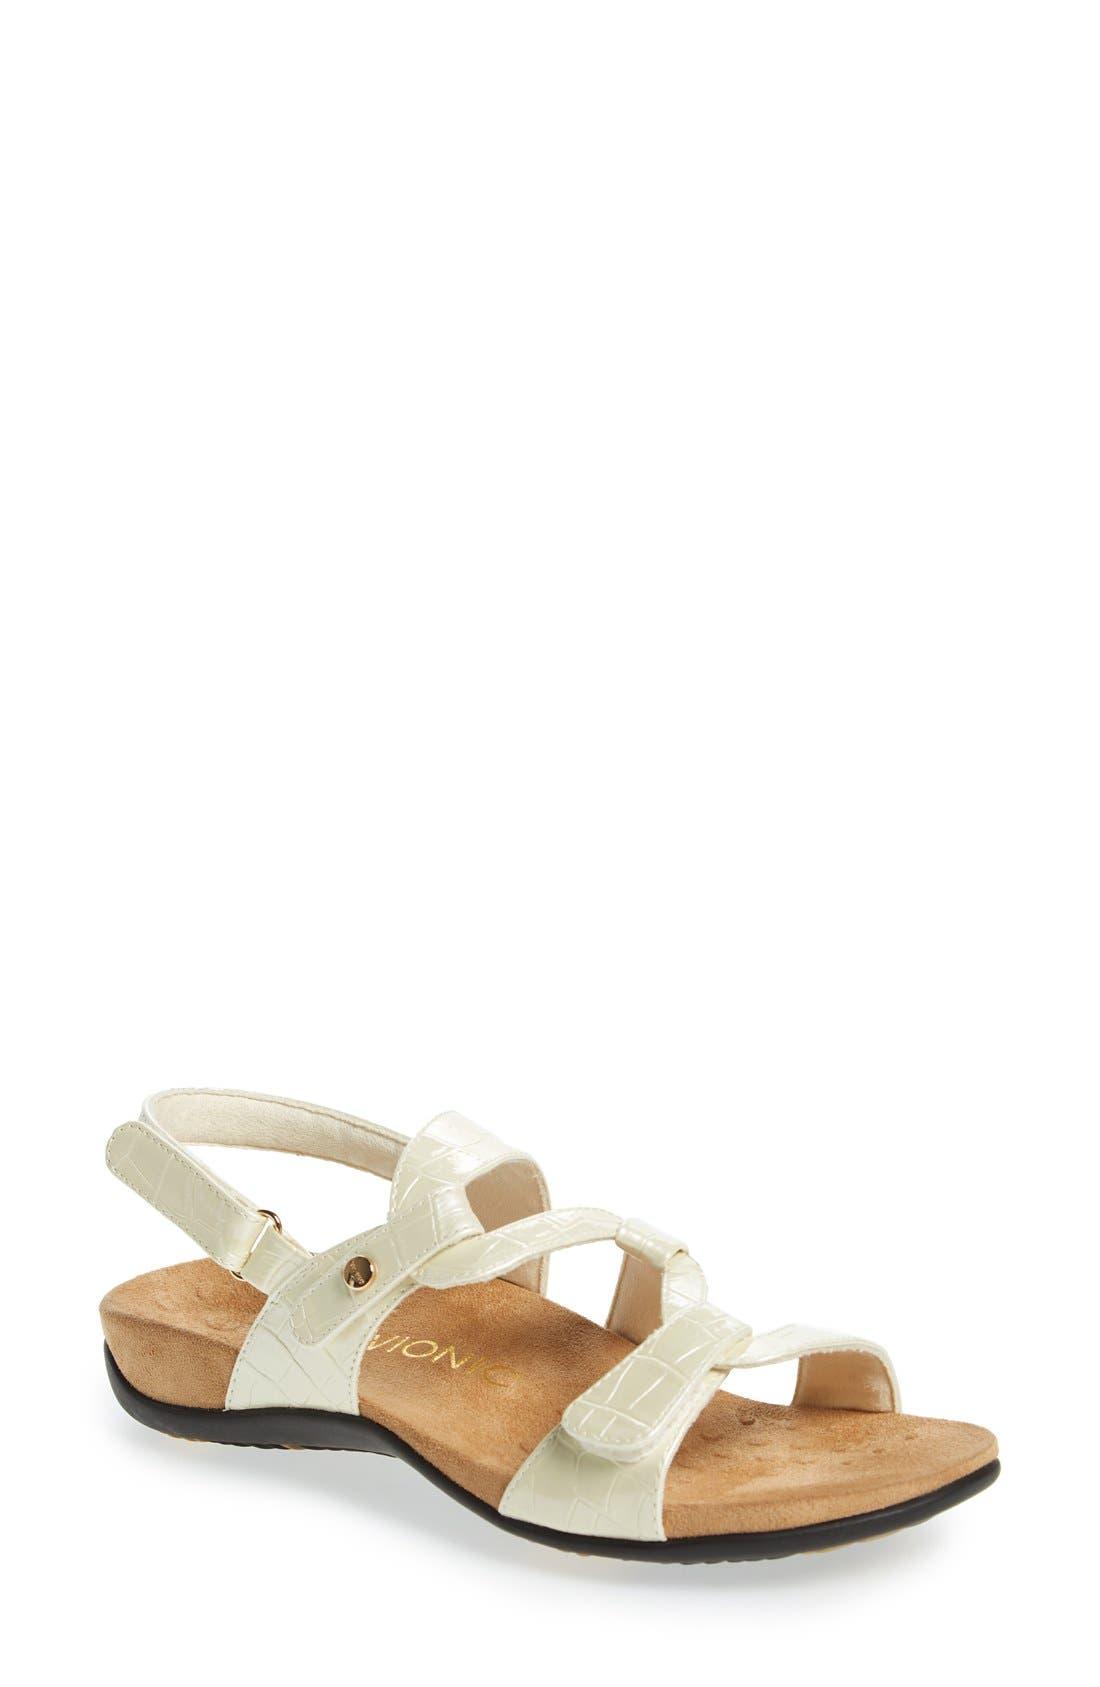 VIONIC 'Paros' Sandal